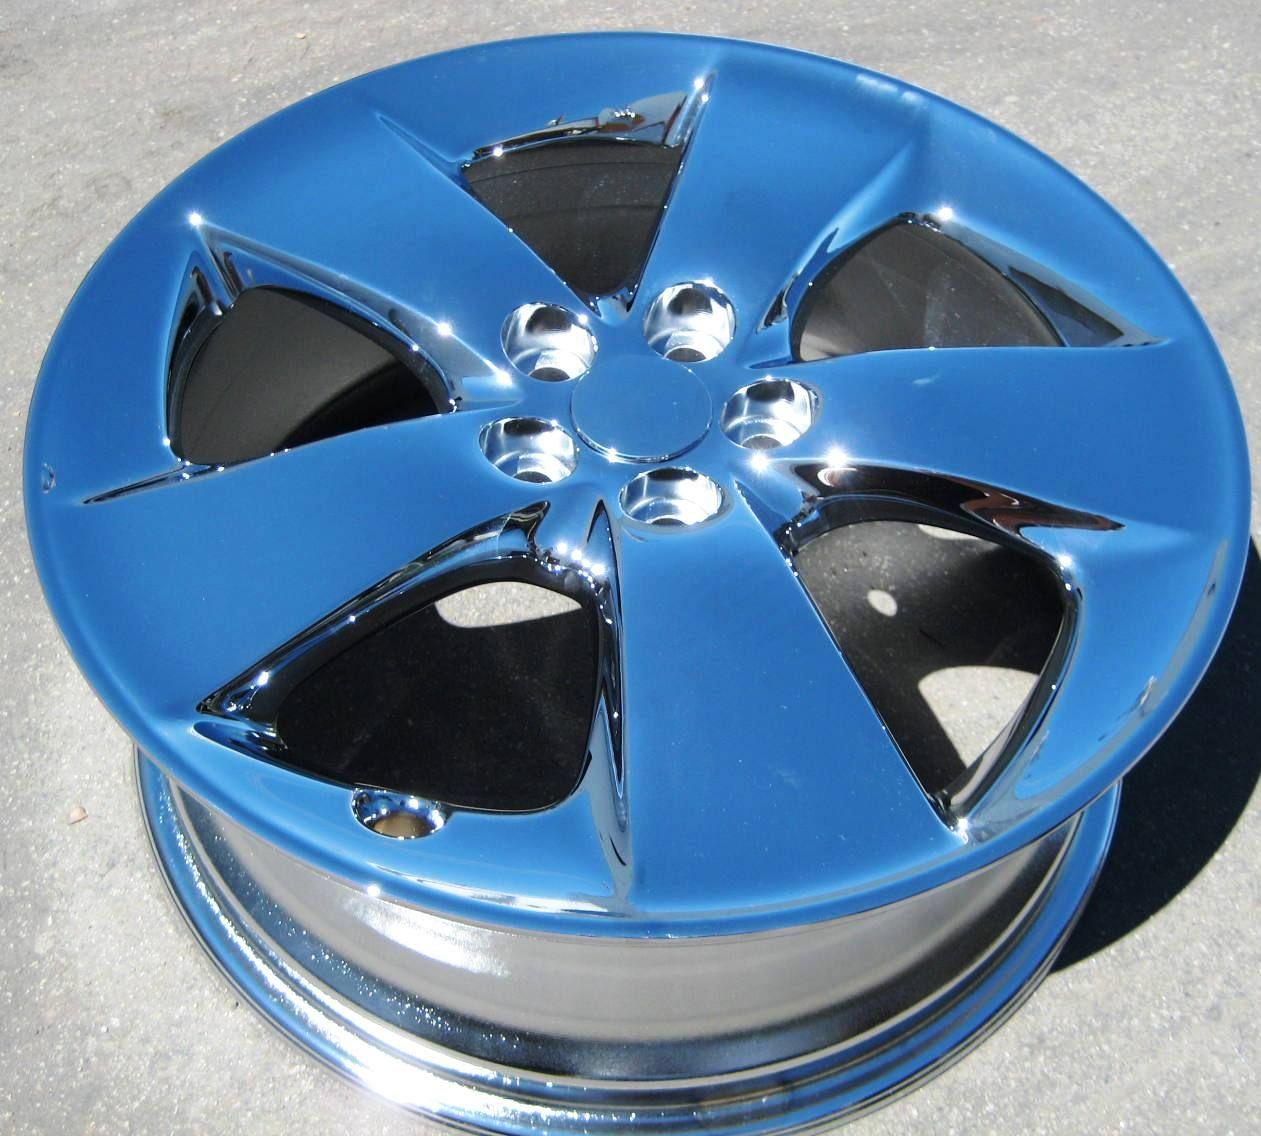 Stock 4 New 17 Factory Toyota Prius Chrome Wheels Rims 2010 12